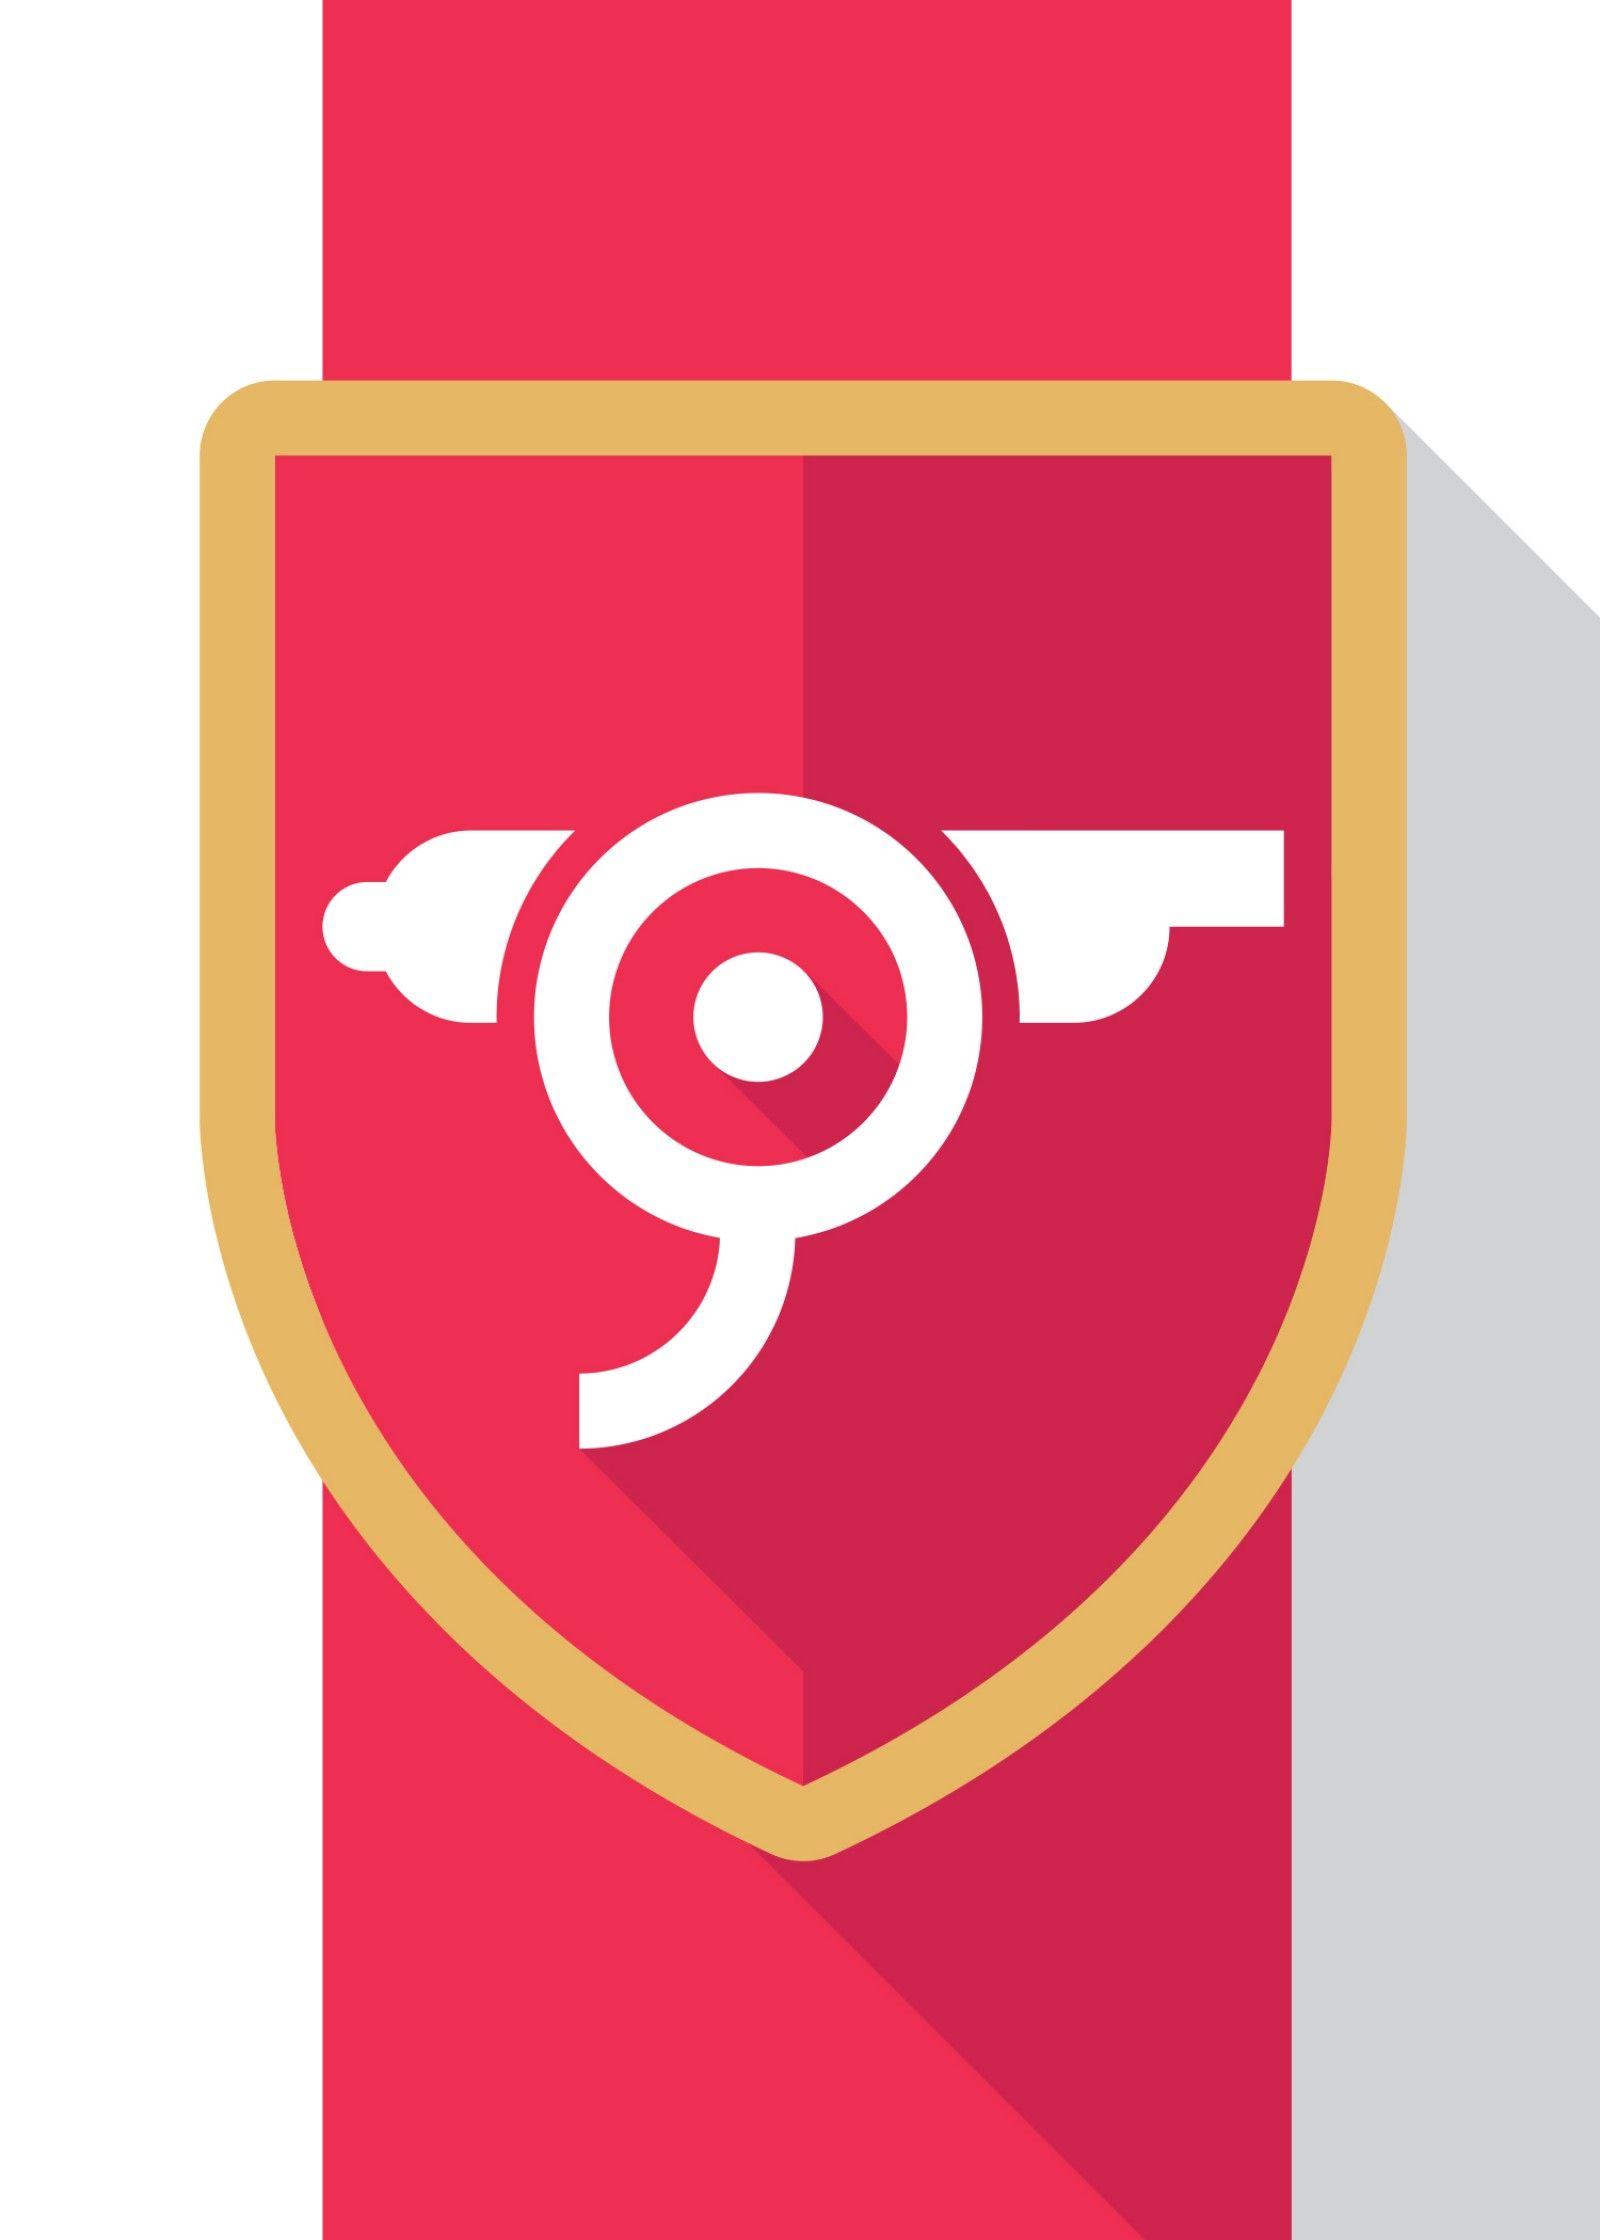 Minimalist Arsenal Gunners Logo Futbol Artist Network